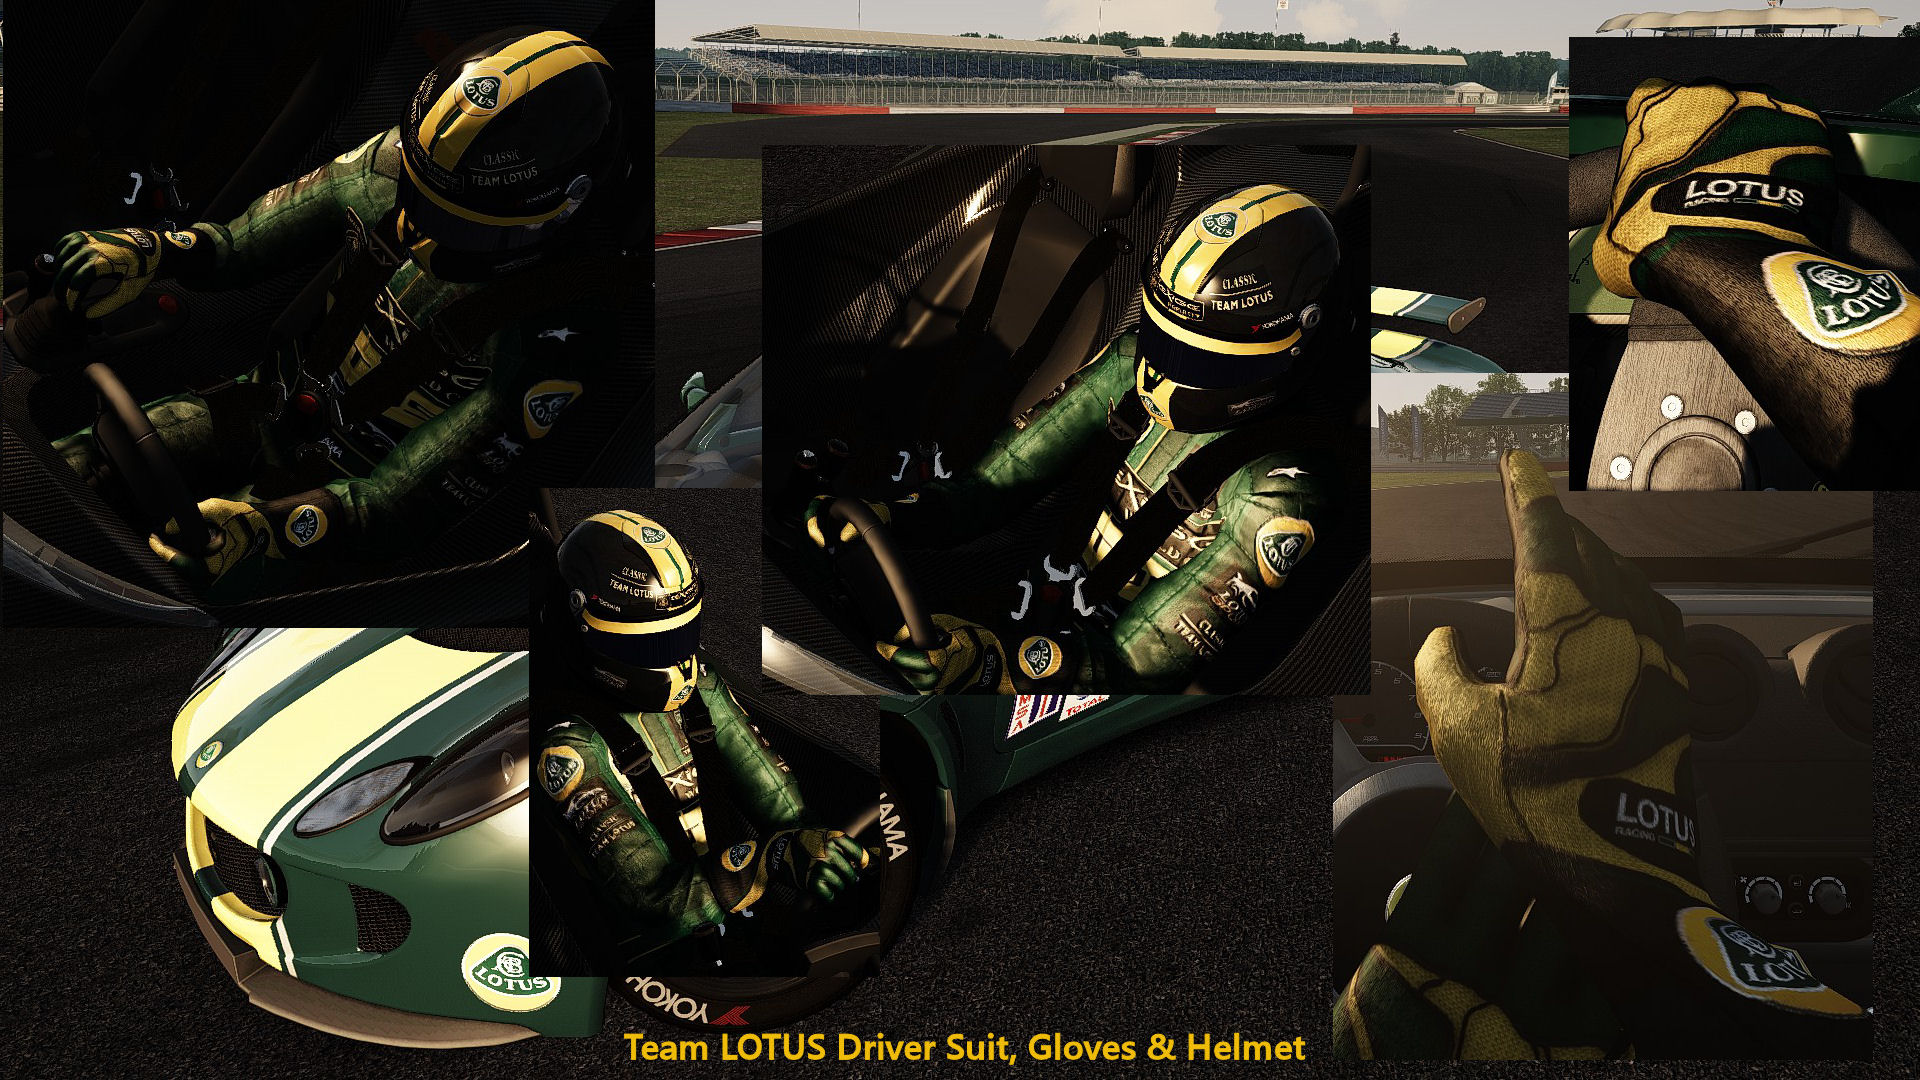 Lotus Driversuit RC1.jpg